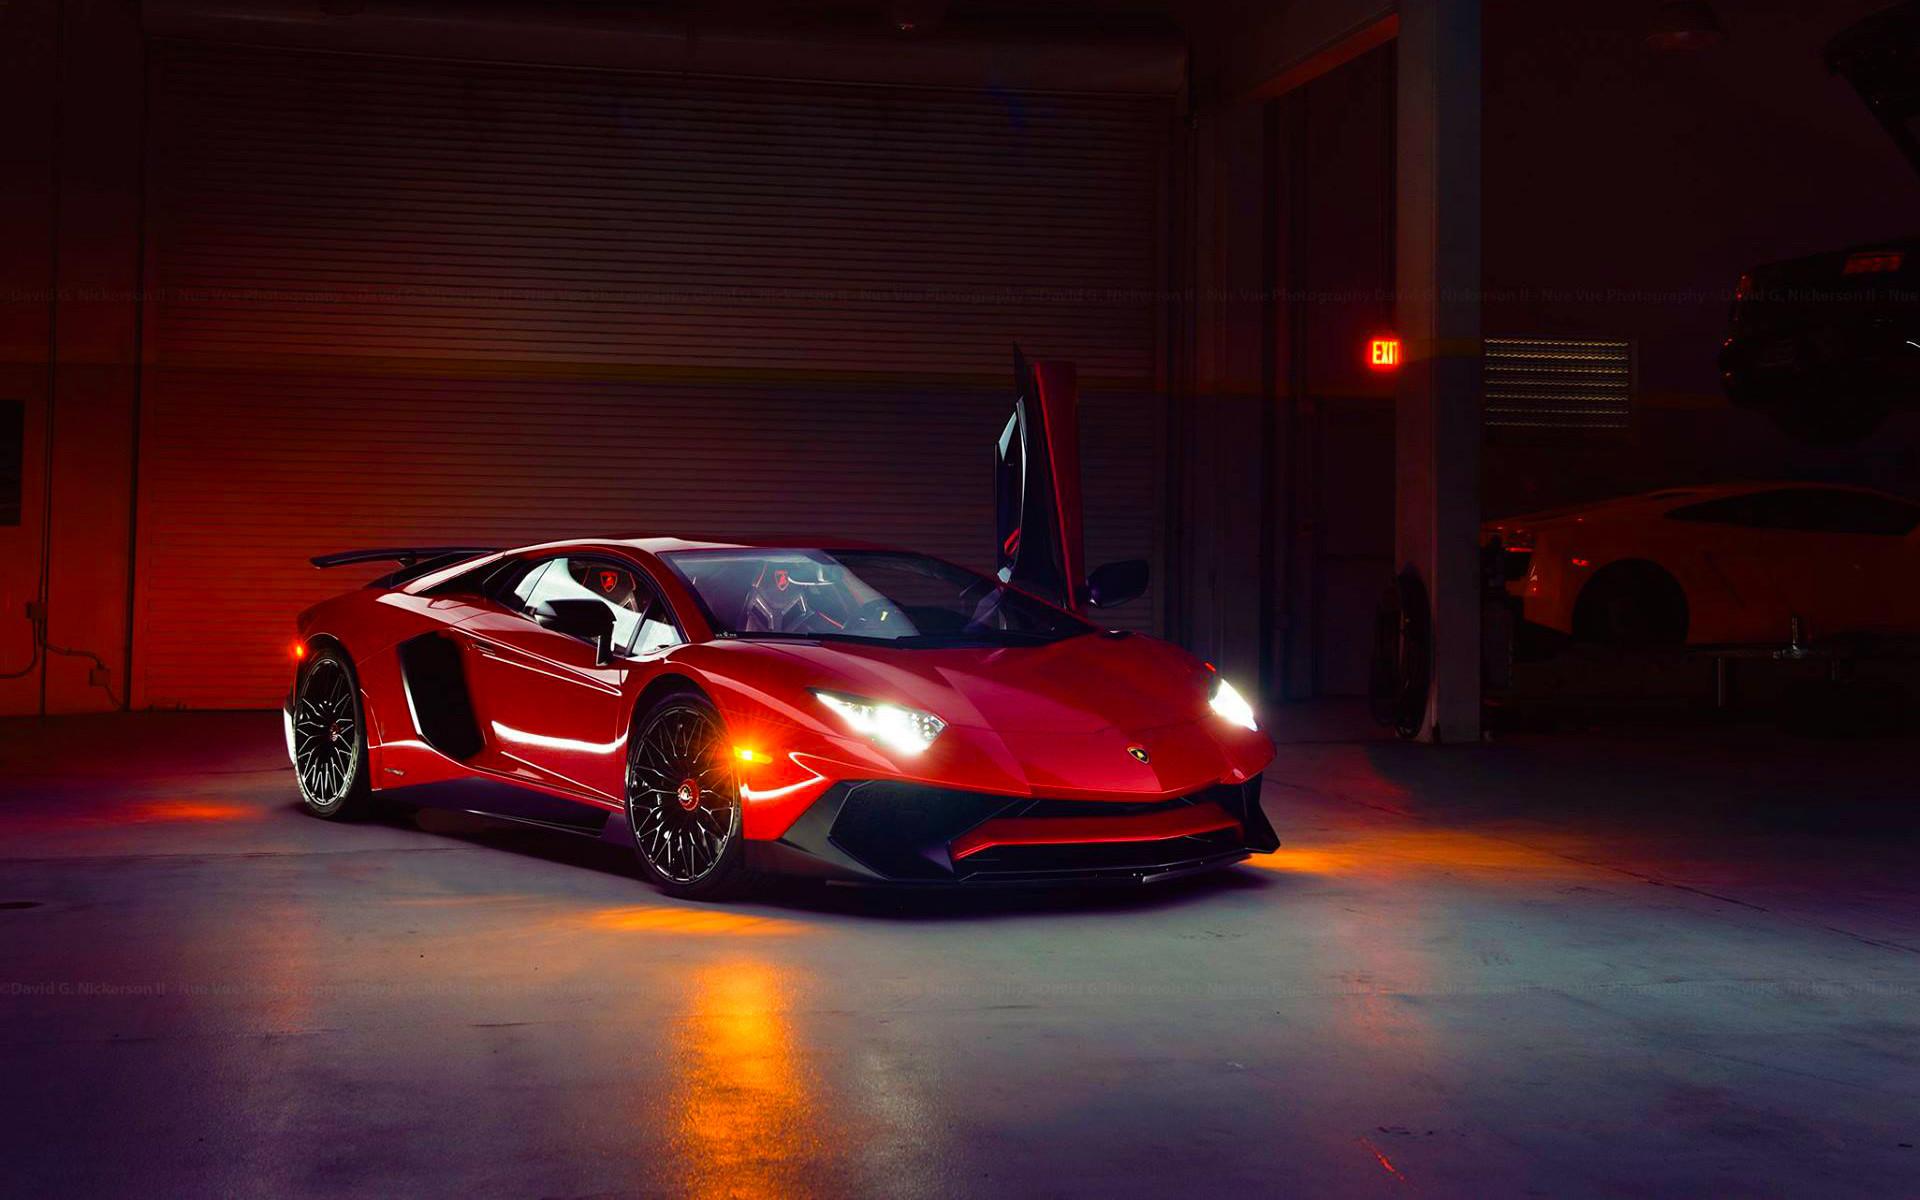 Lamborghini Desktop HD Wallpaper 59990